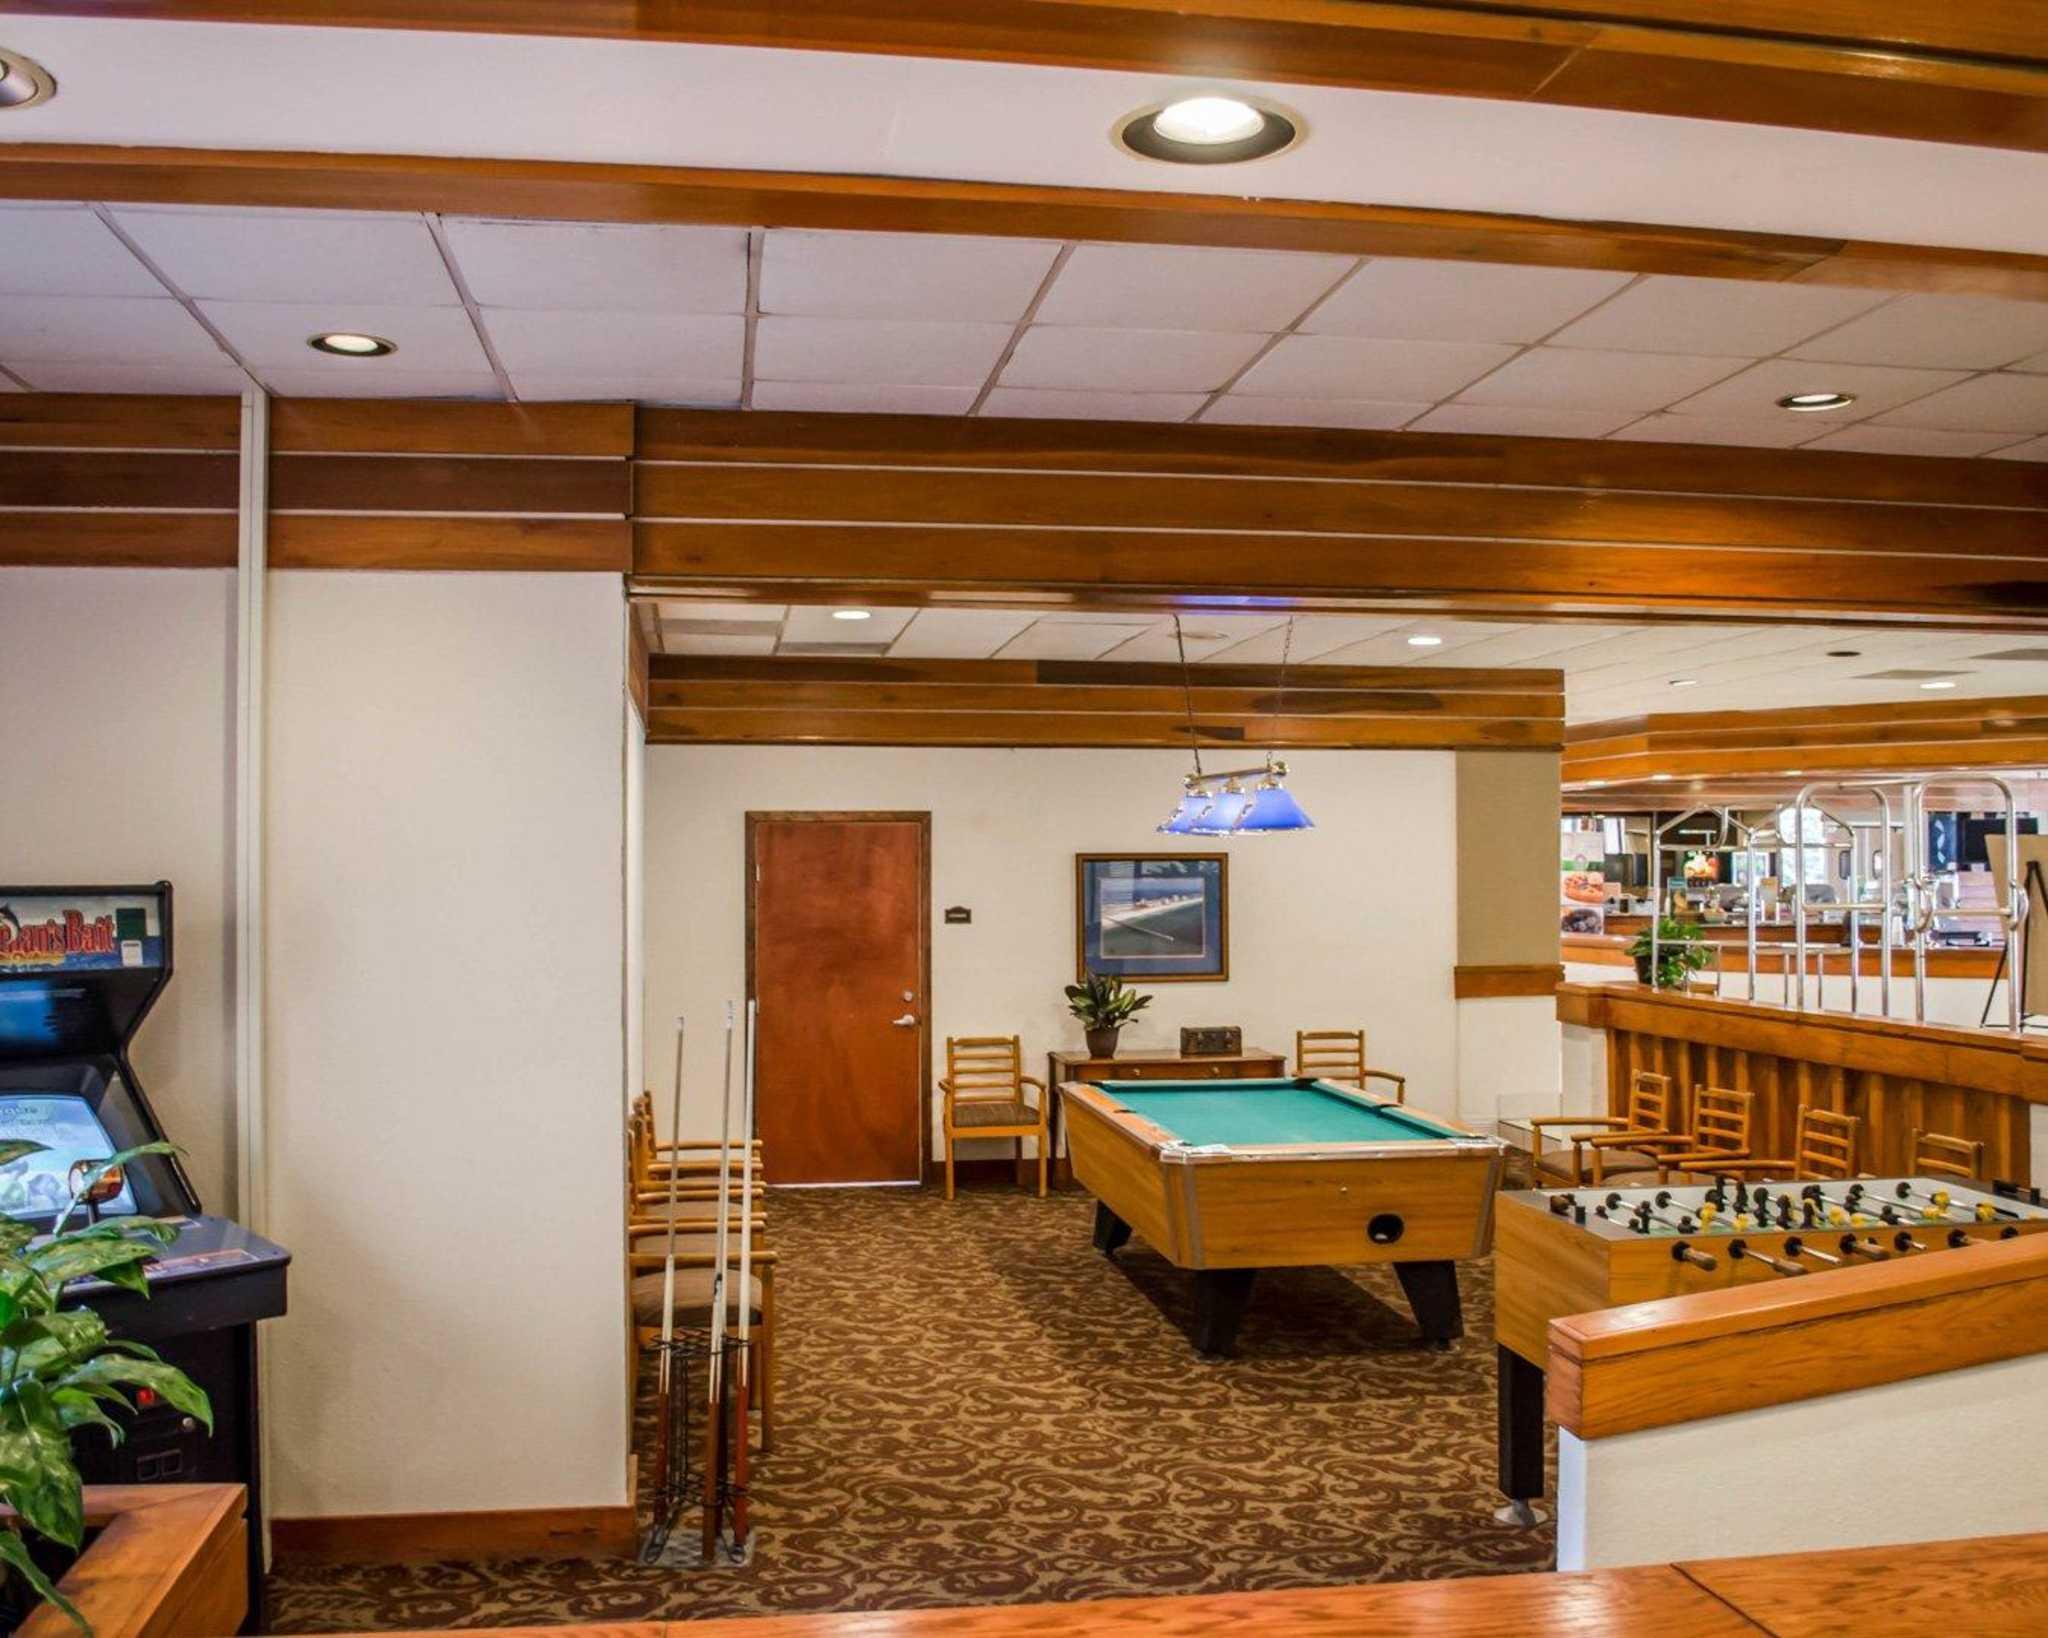 Quality Inn & Suites Pensacola Bayview in Pensacola, FL, photo #6